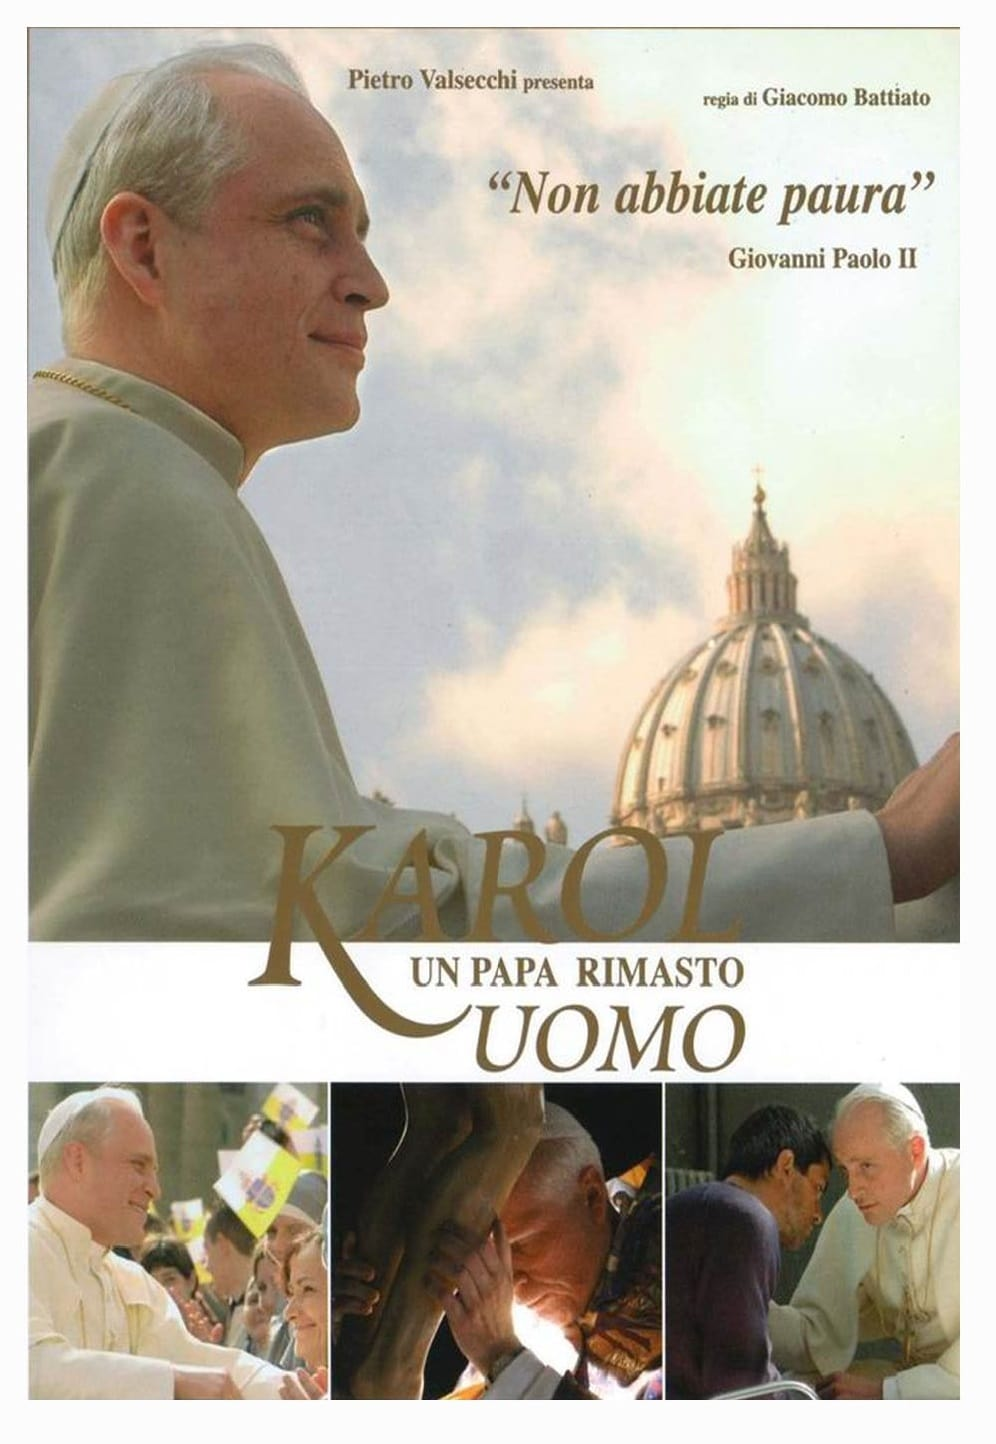 Karol: The Pope, The Man (2006)